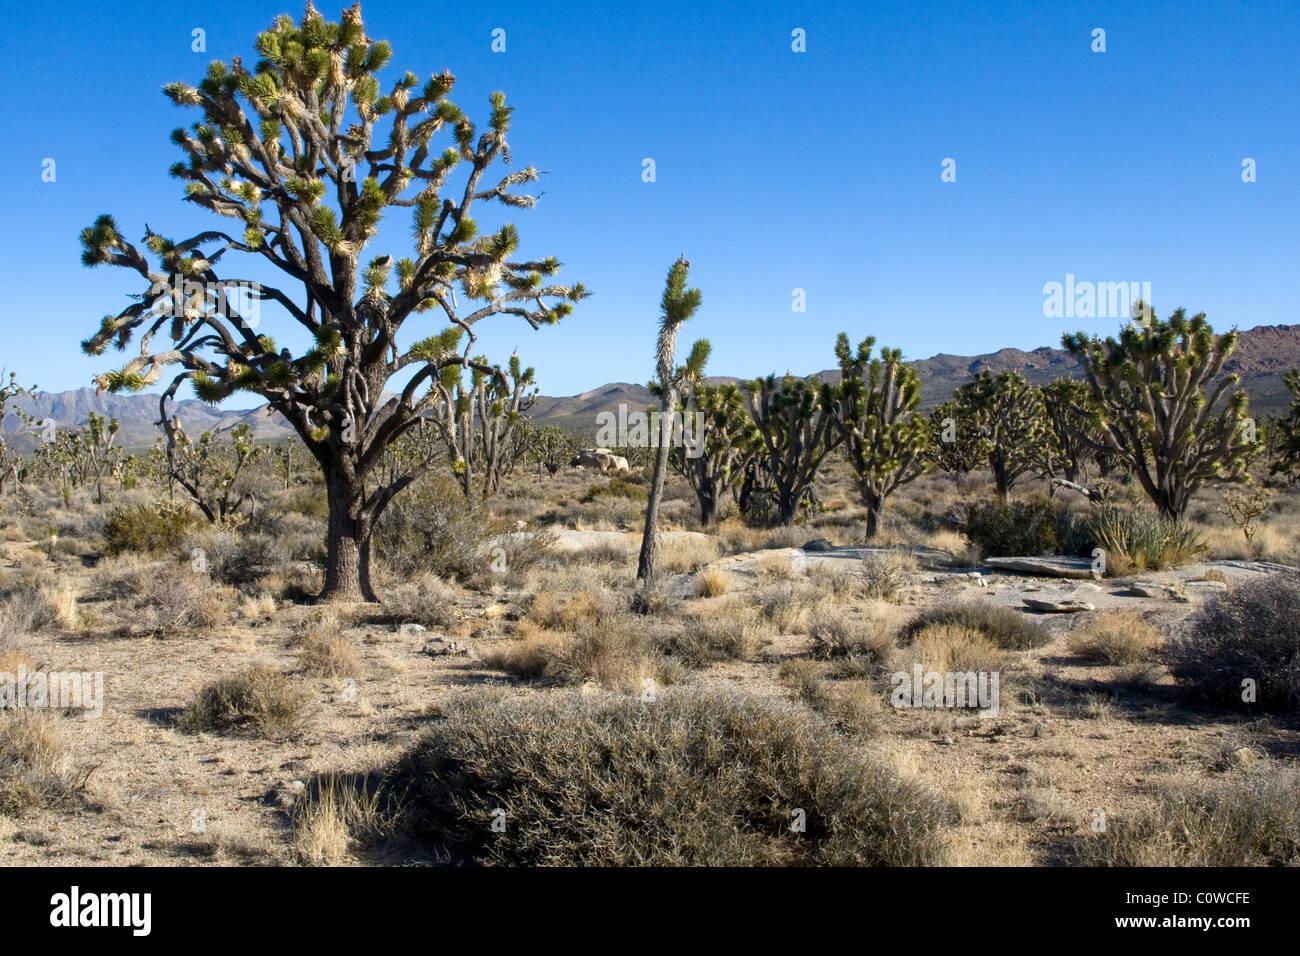 Joshua tree (Yucca brevifolia) forest in the Mojave Desert, California. - Stock Image